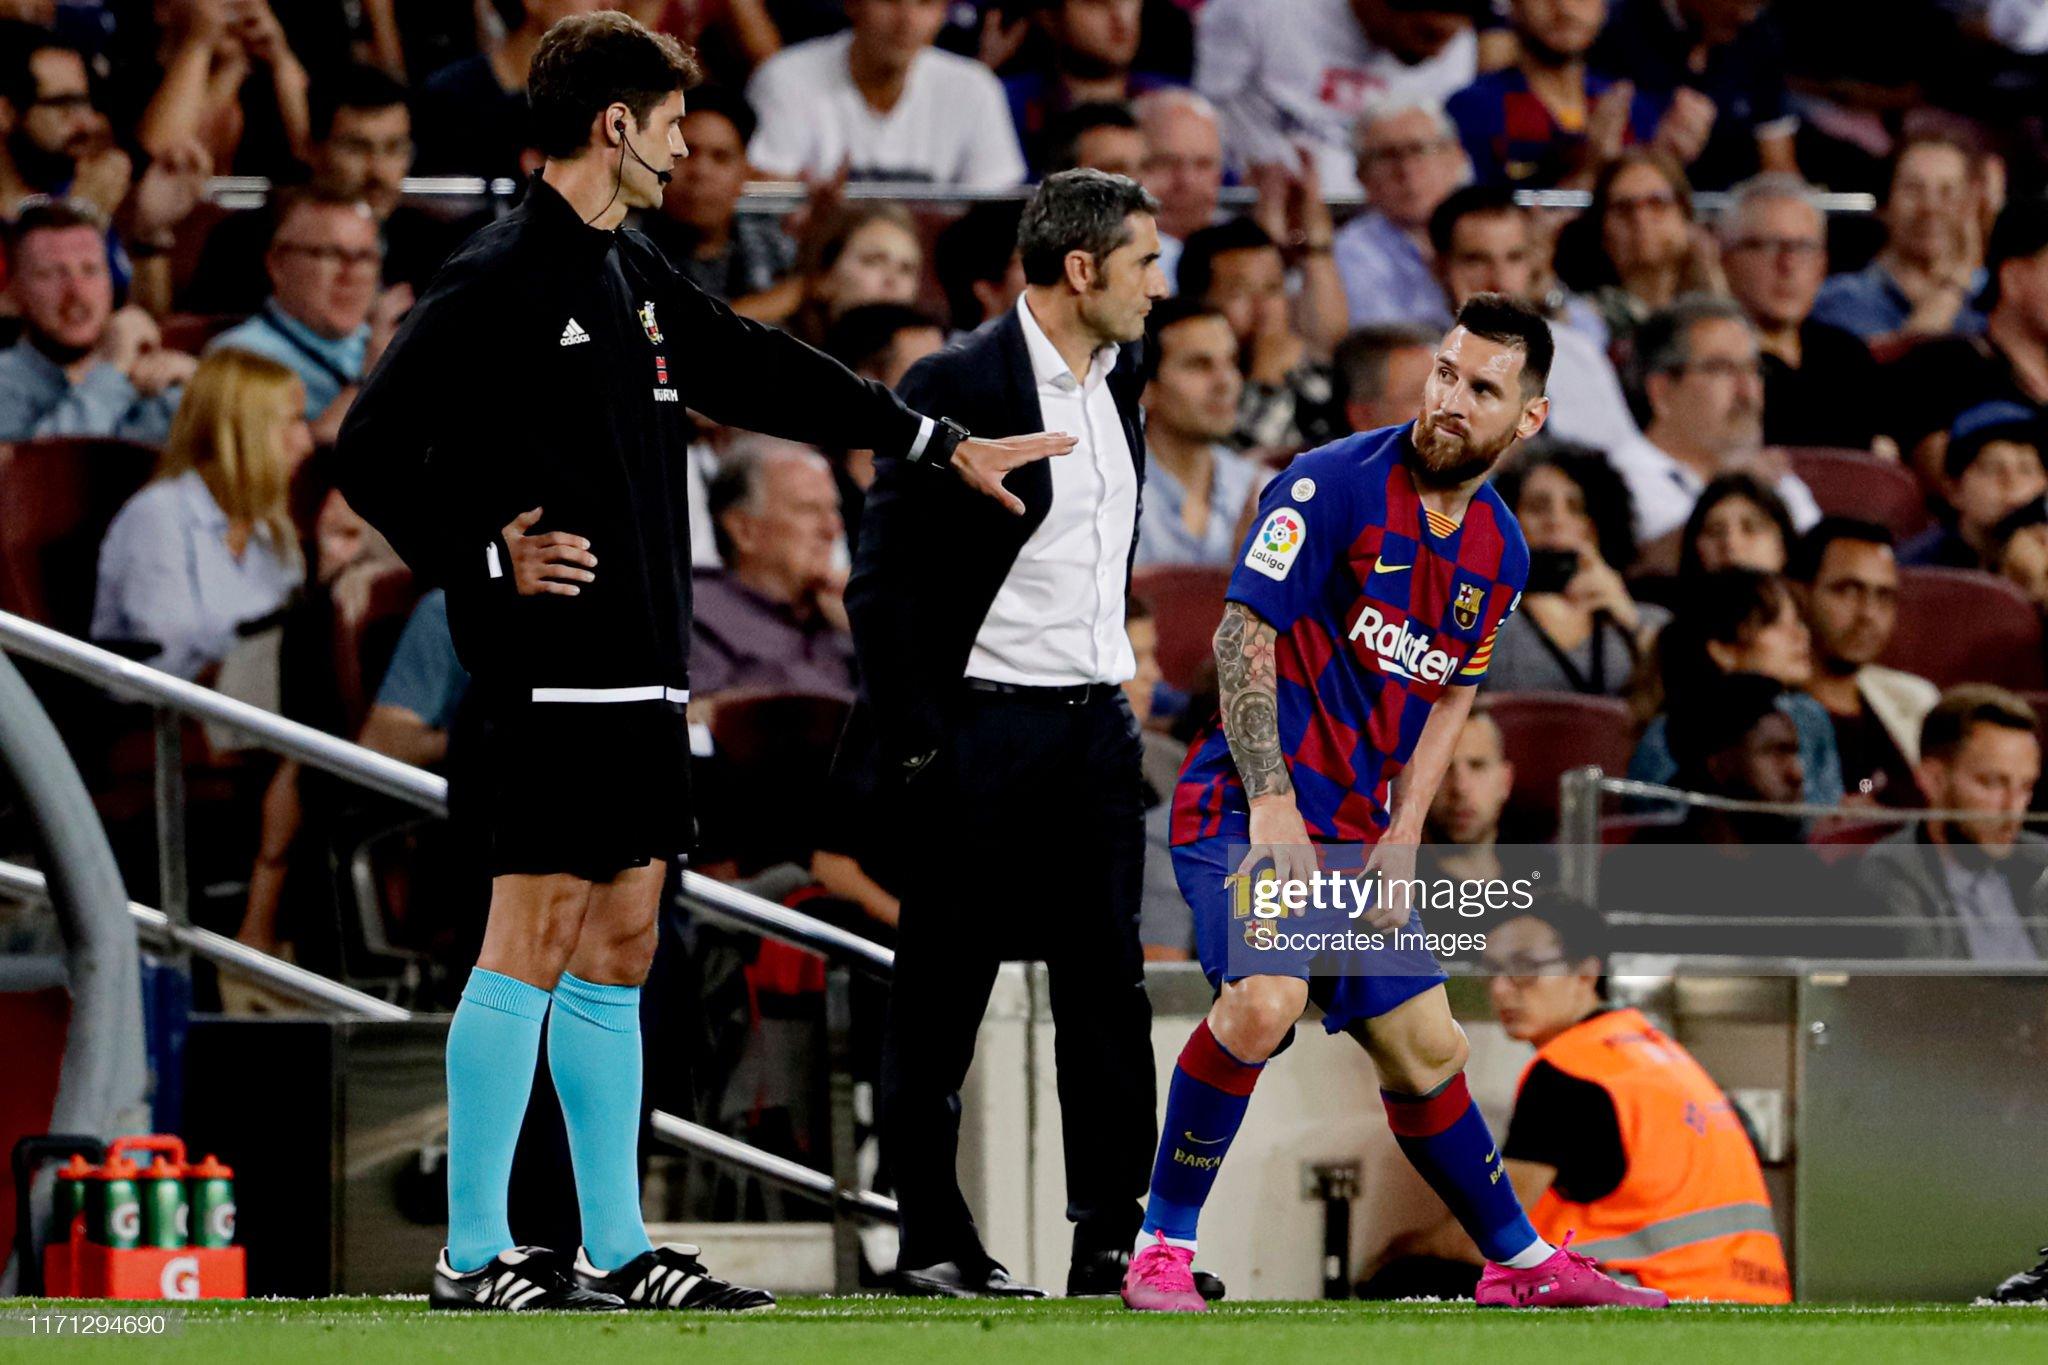 صور مباراة : برشلونة - فياريال 2-1 ( 24-09-2019 )  Lionel-messi-of-fc-barcelona-during-the-la-liga-santander-match-fc-picture-id1171294690?s=2048x2048